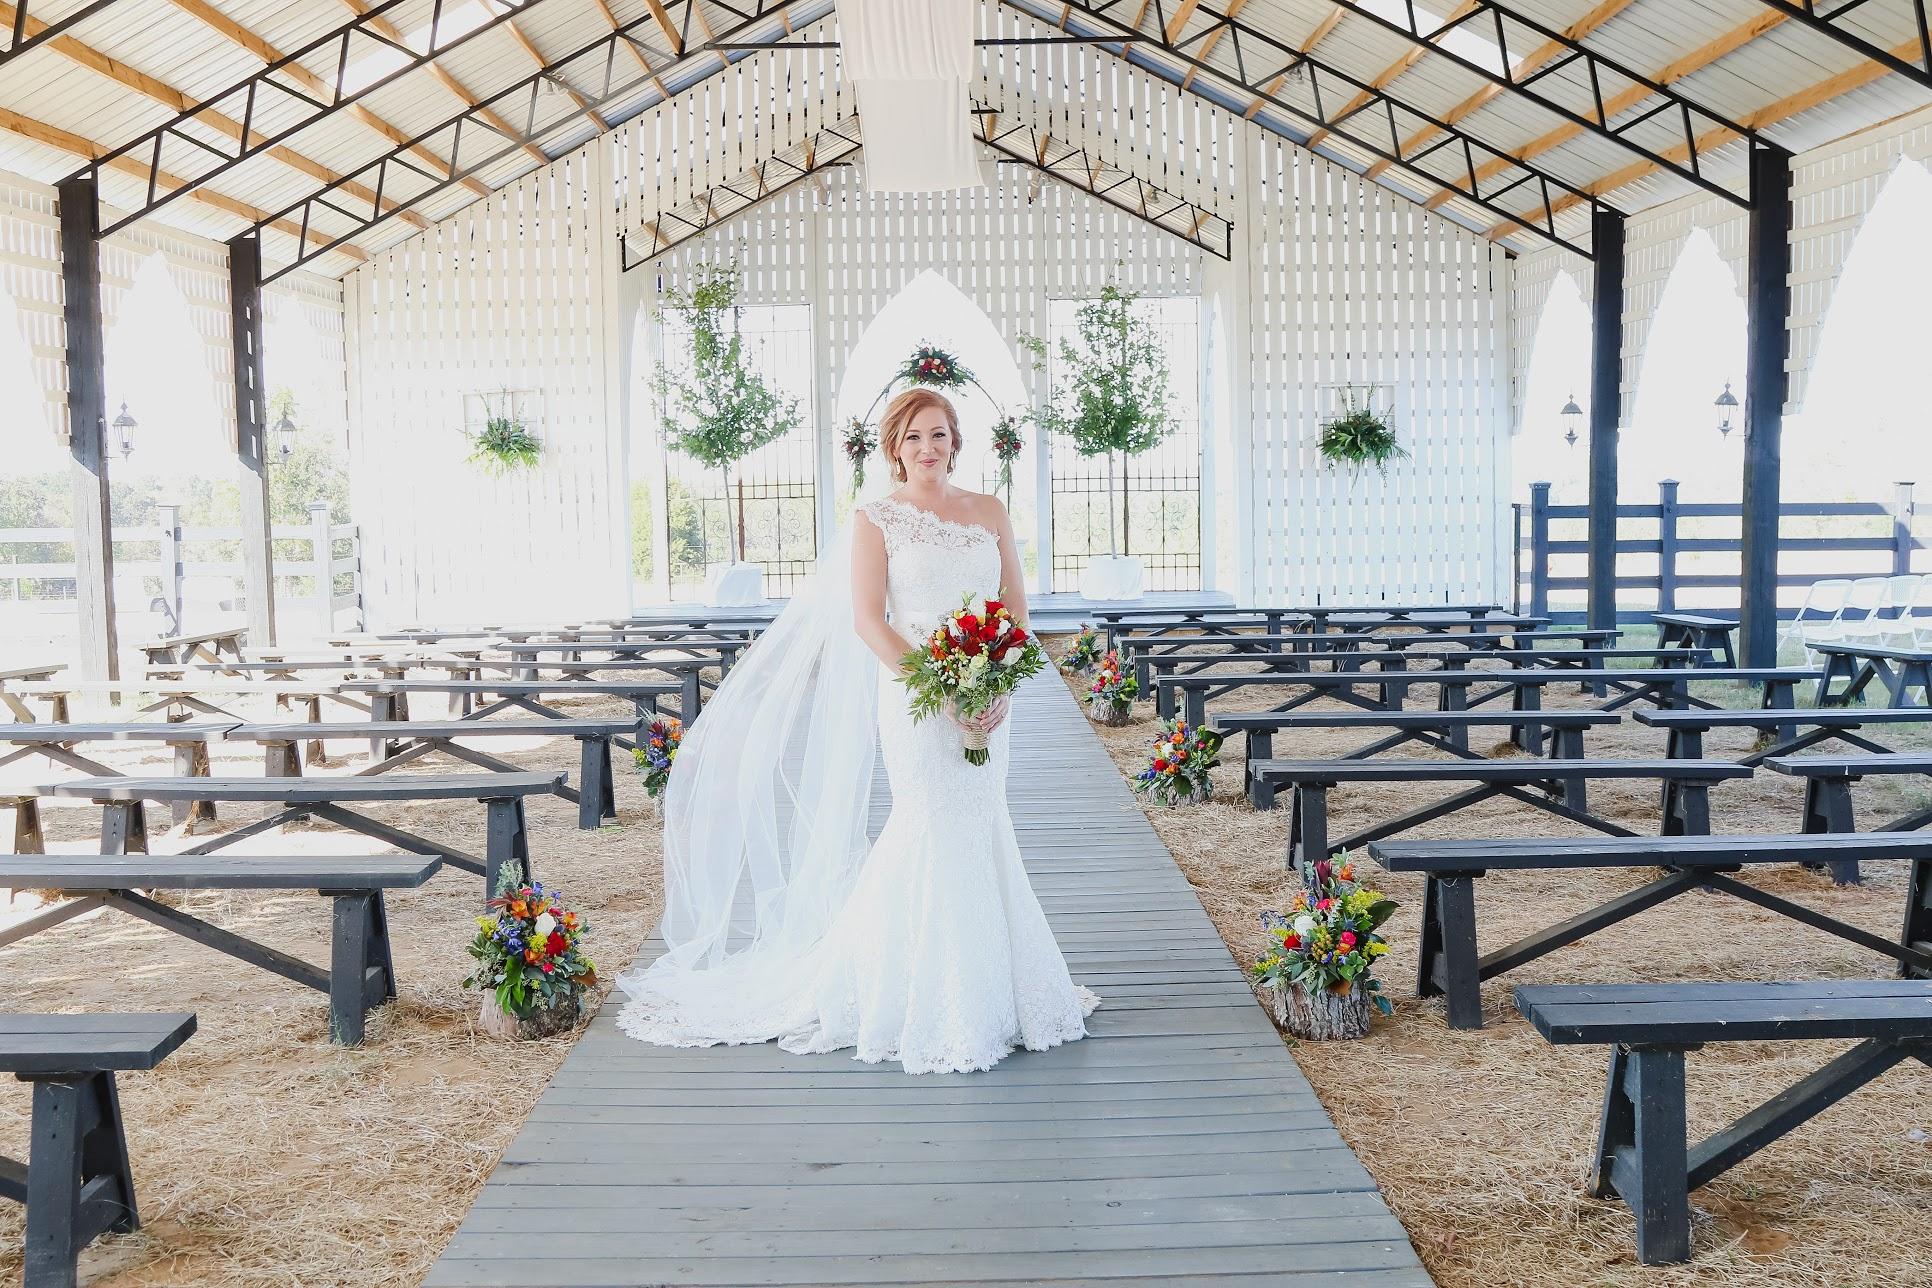 bride in chapel wedding dress one shoulder dress